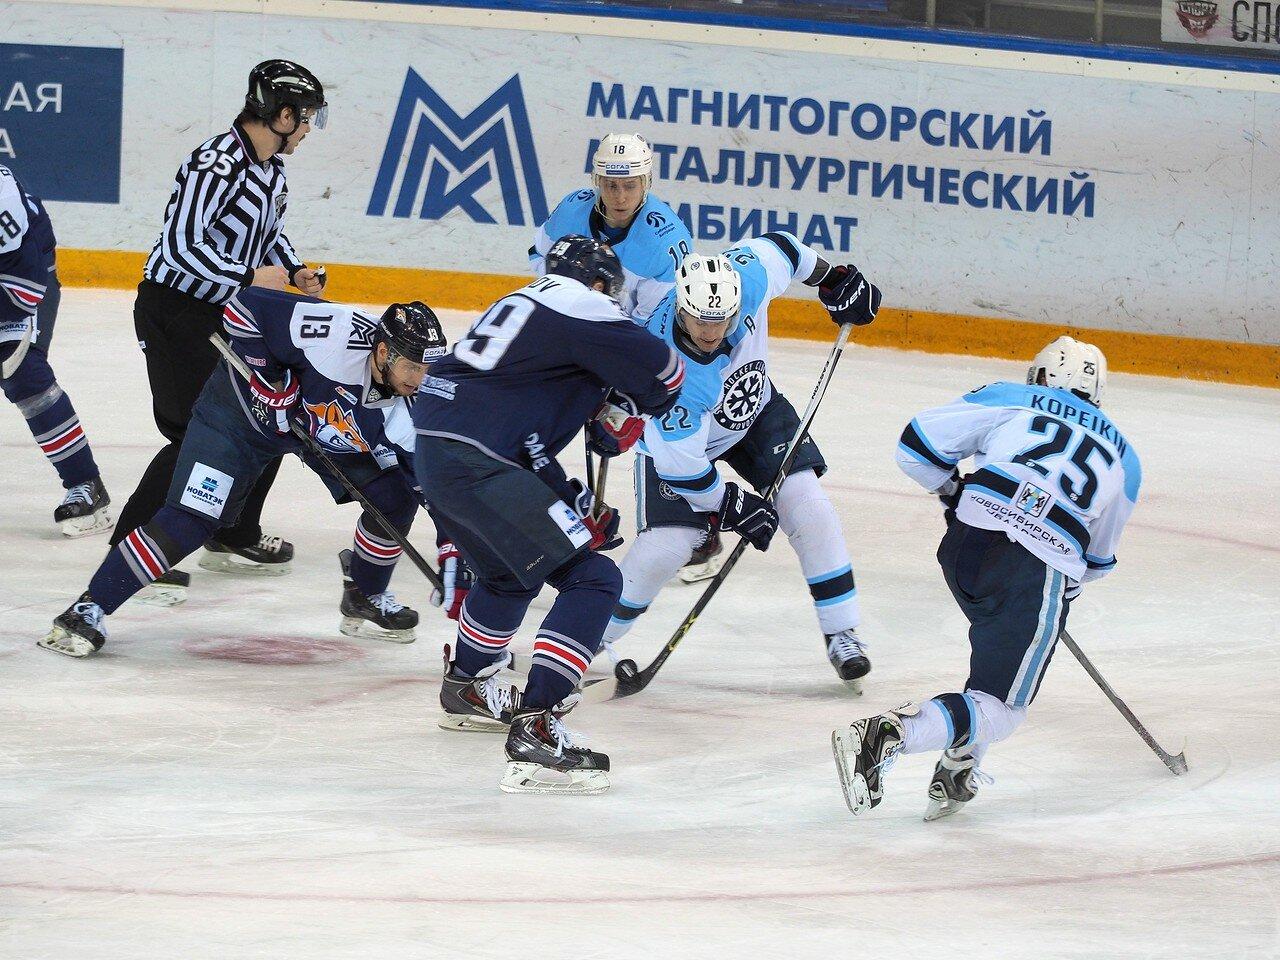 95Плей-офф 2016 Восток 1/2 Металлург - Сибирь 10.03.2016